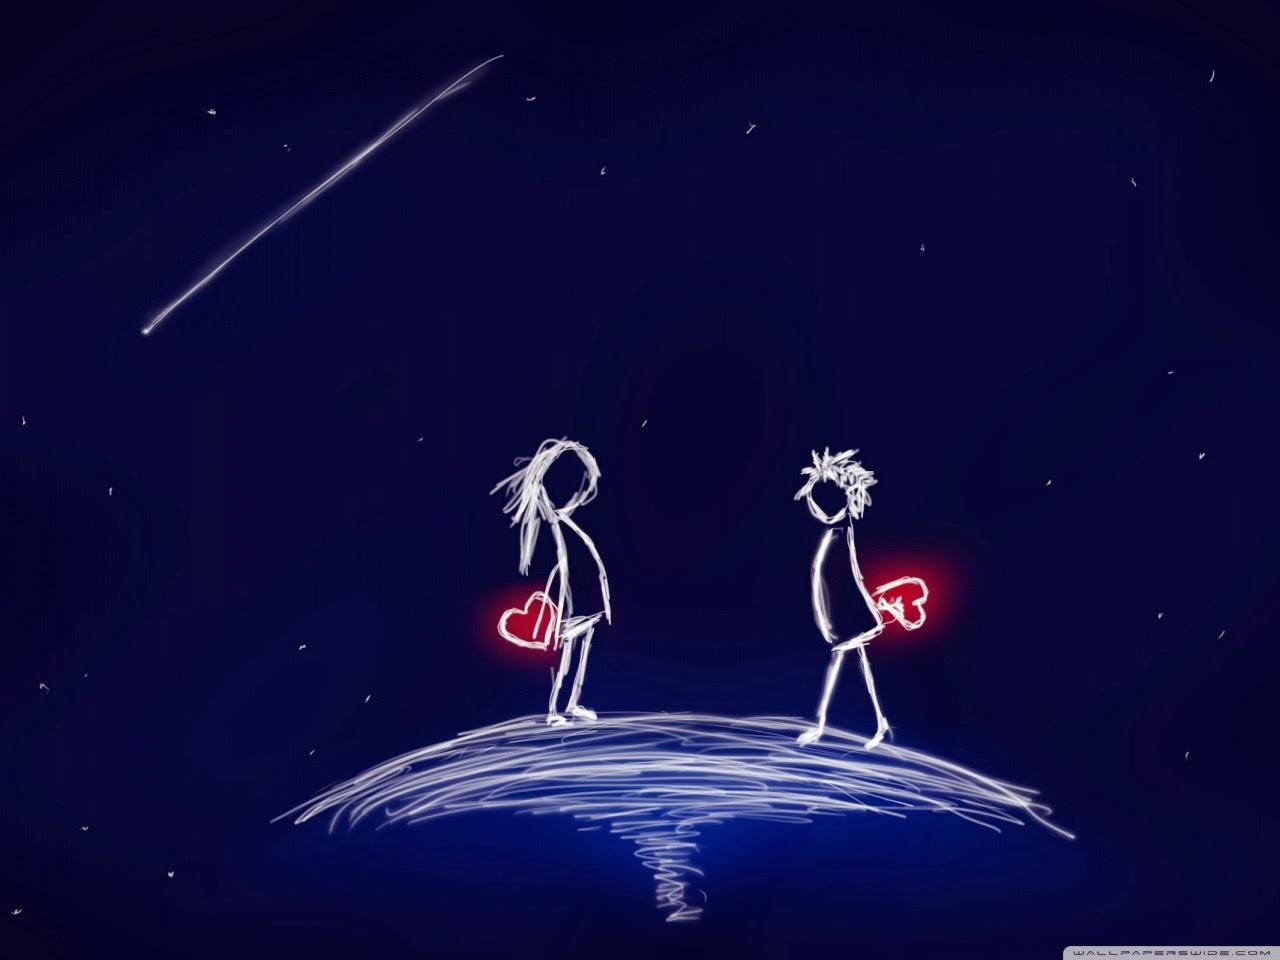 i love you komal name wallpaper,animated cartoon,sky,animation,atmosphere,space